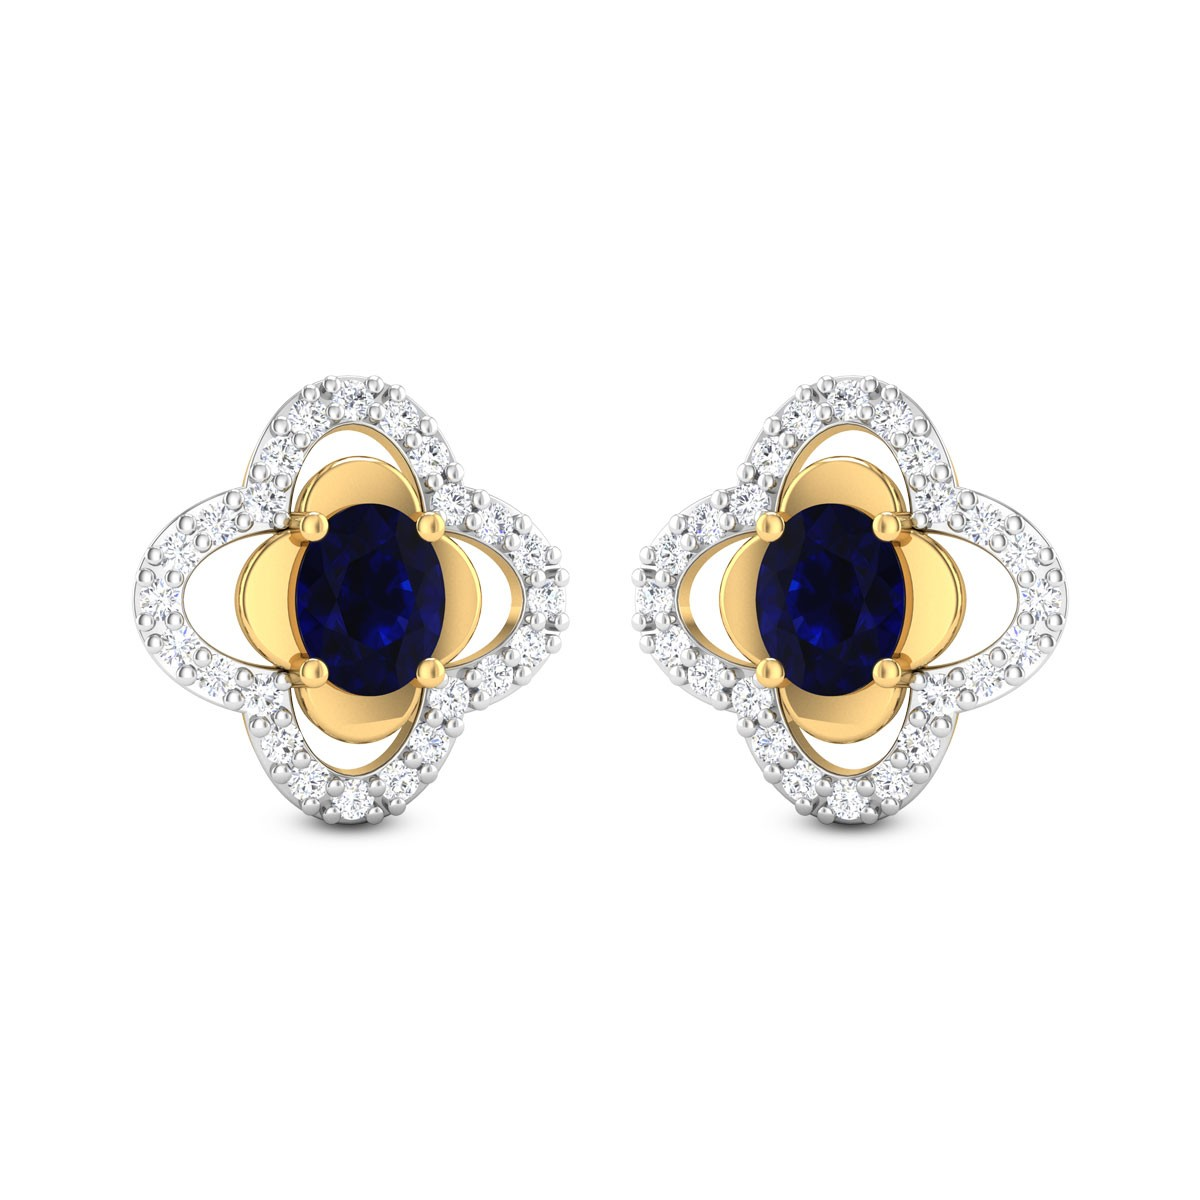 Dual Layer Sapphire Stud Earrings